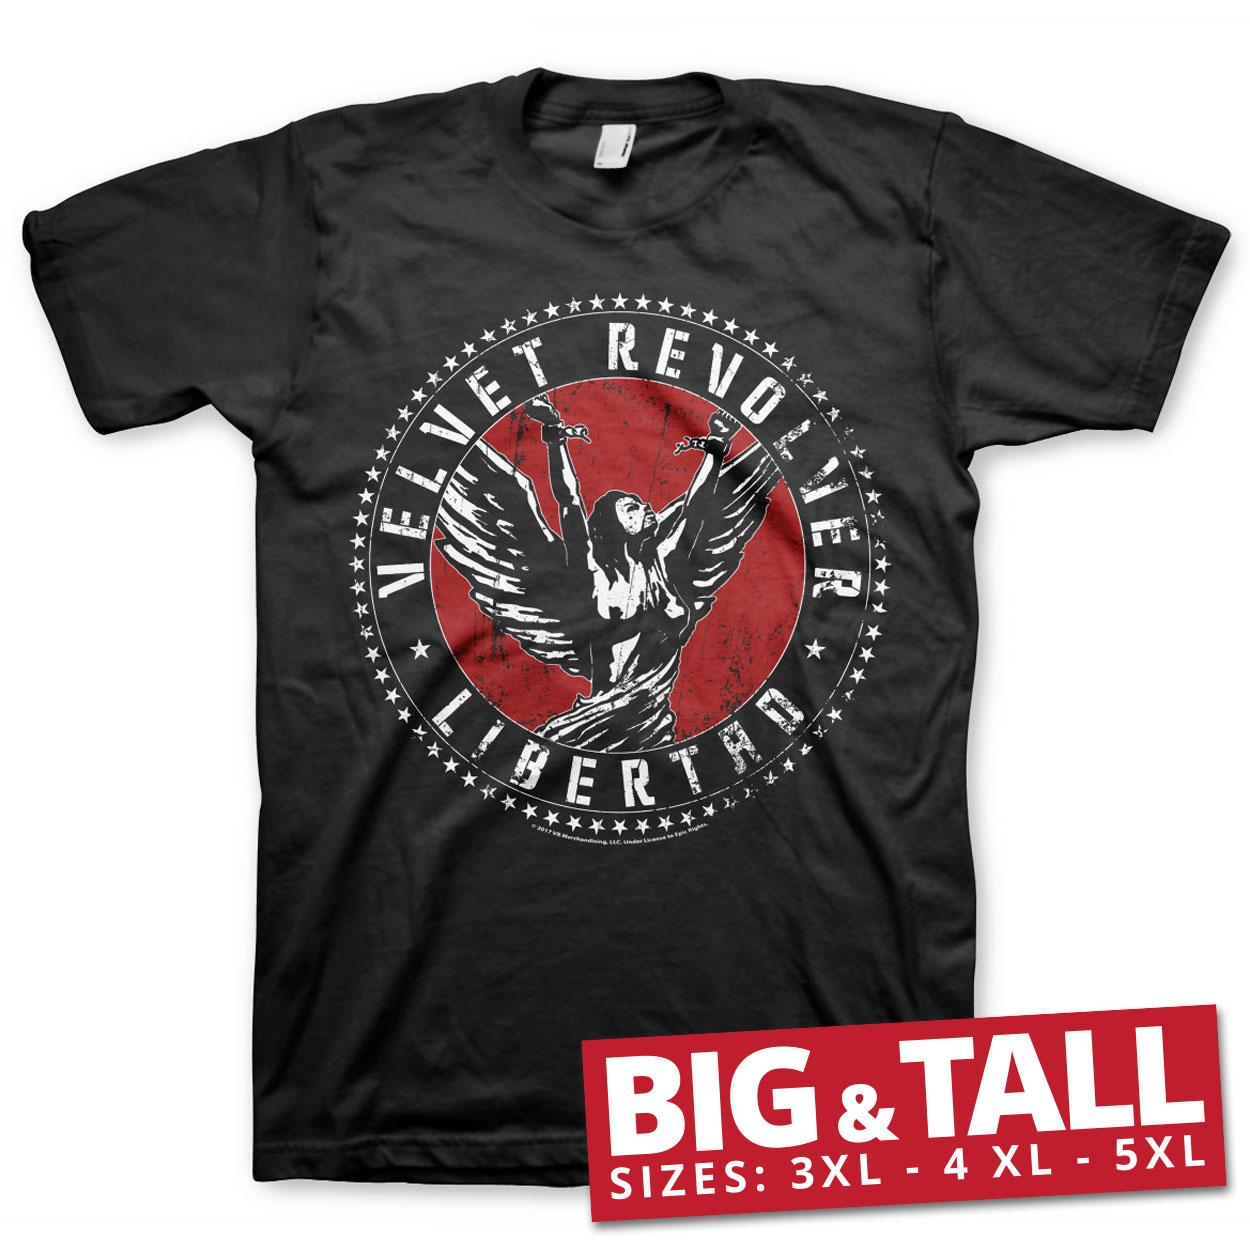 Velvet Revolver Libertad Big & Tall T-Shirt